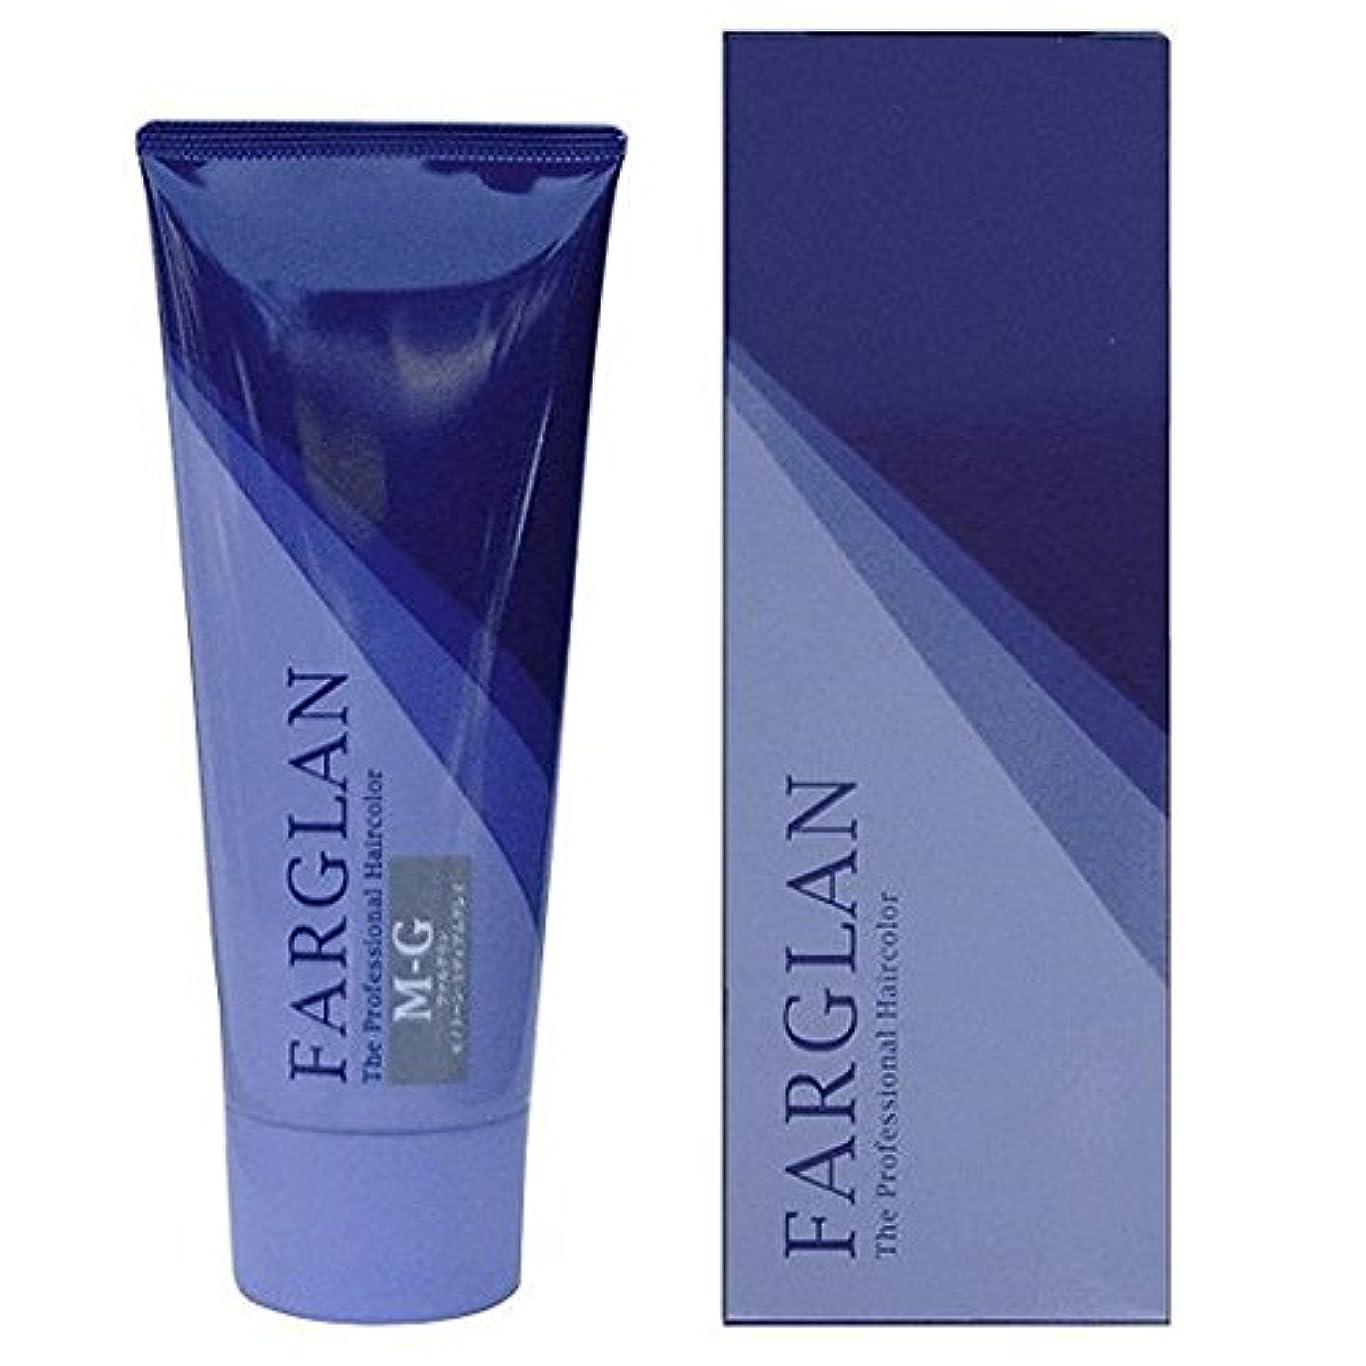 FARGLAN(ファルグラン) ヘアカラー CL(CLEAR) 160g